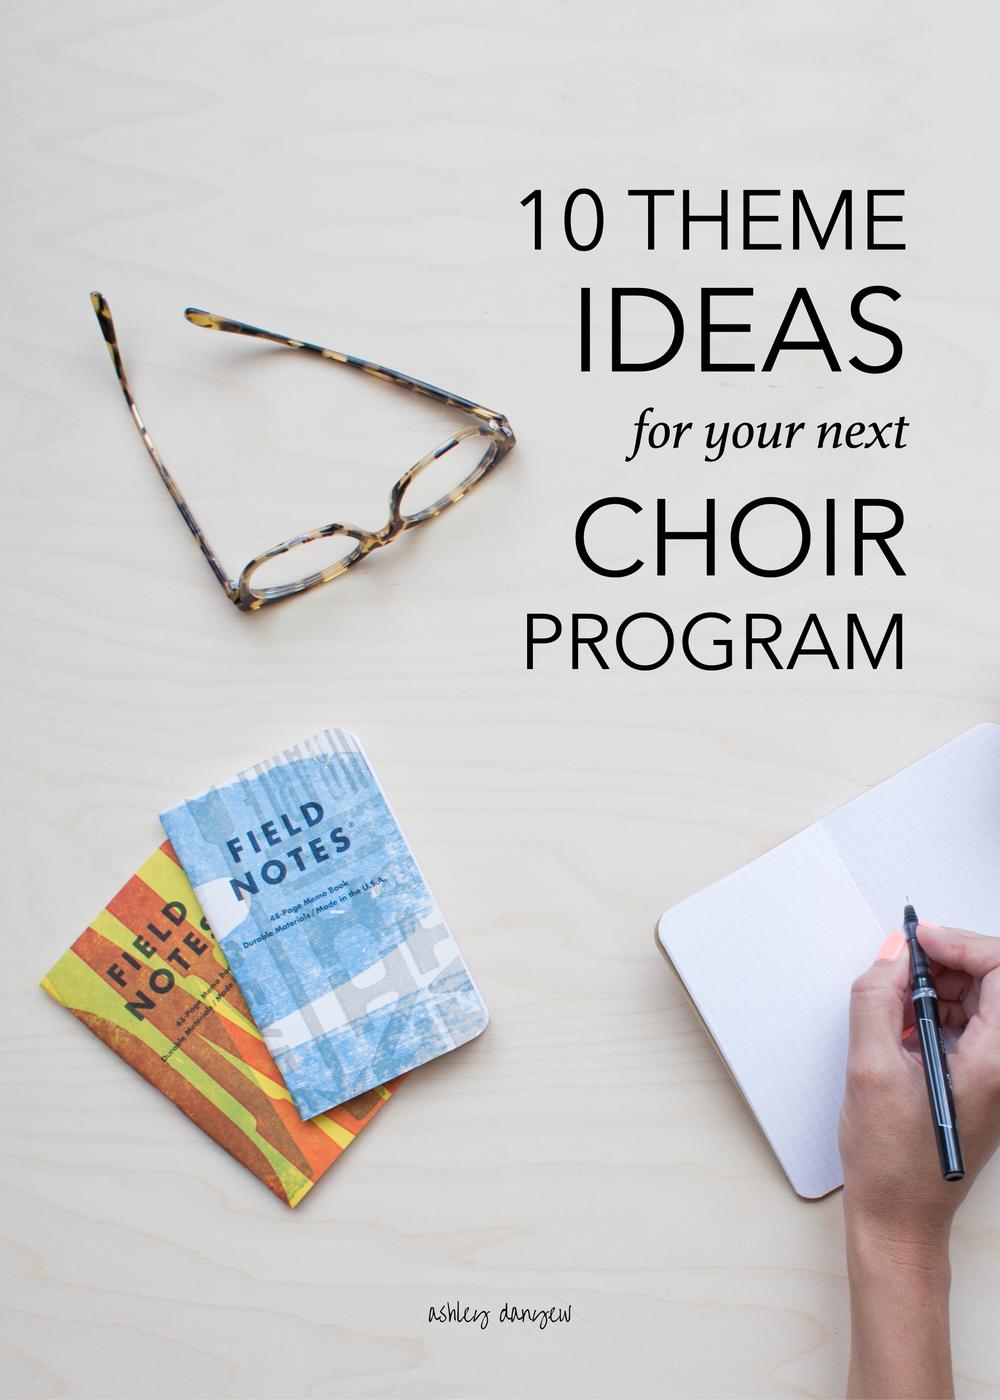 10 Theme Ideas For Your Next Choir Program Ashley Danyew